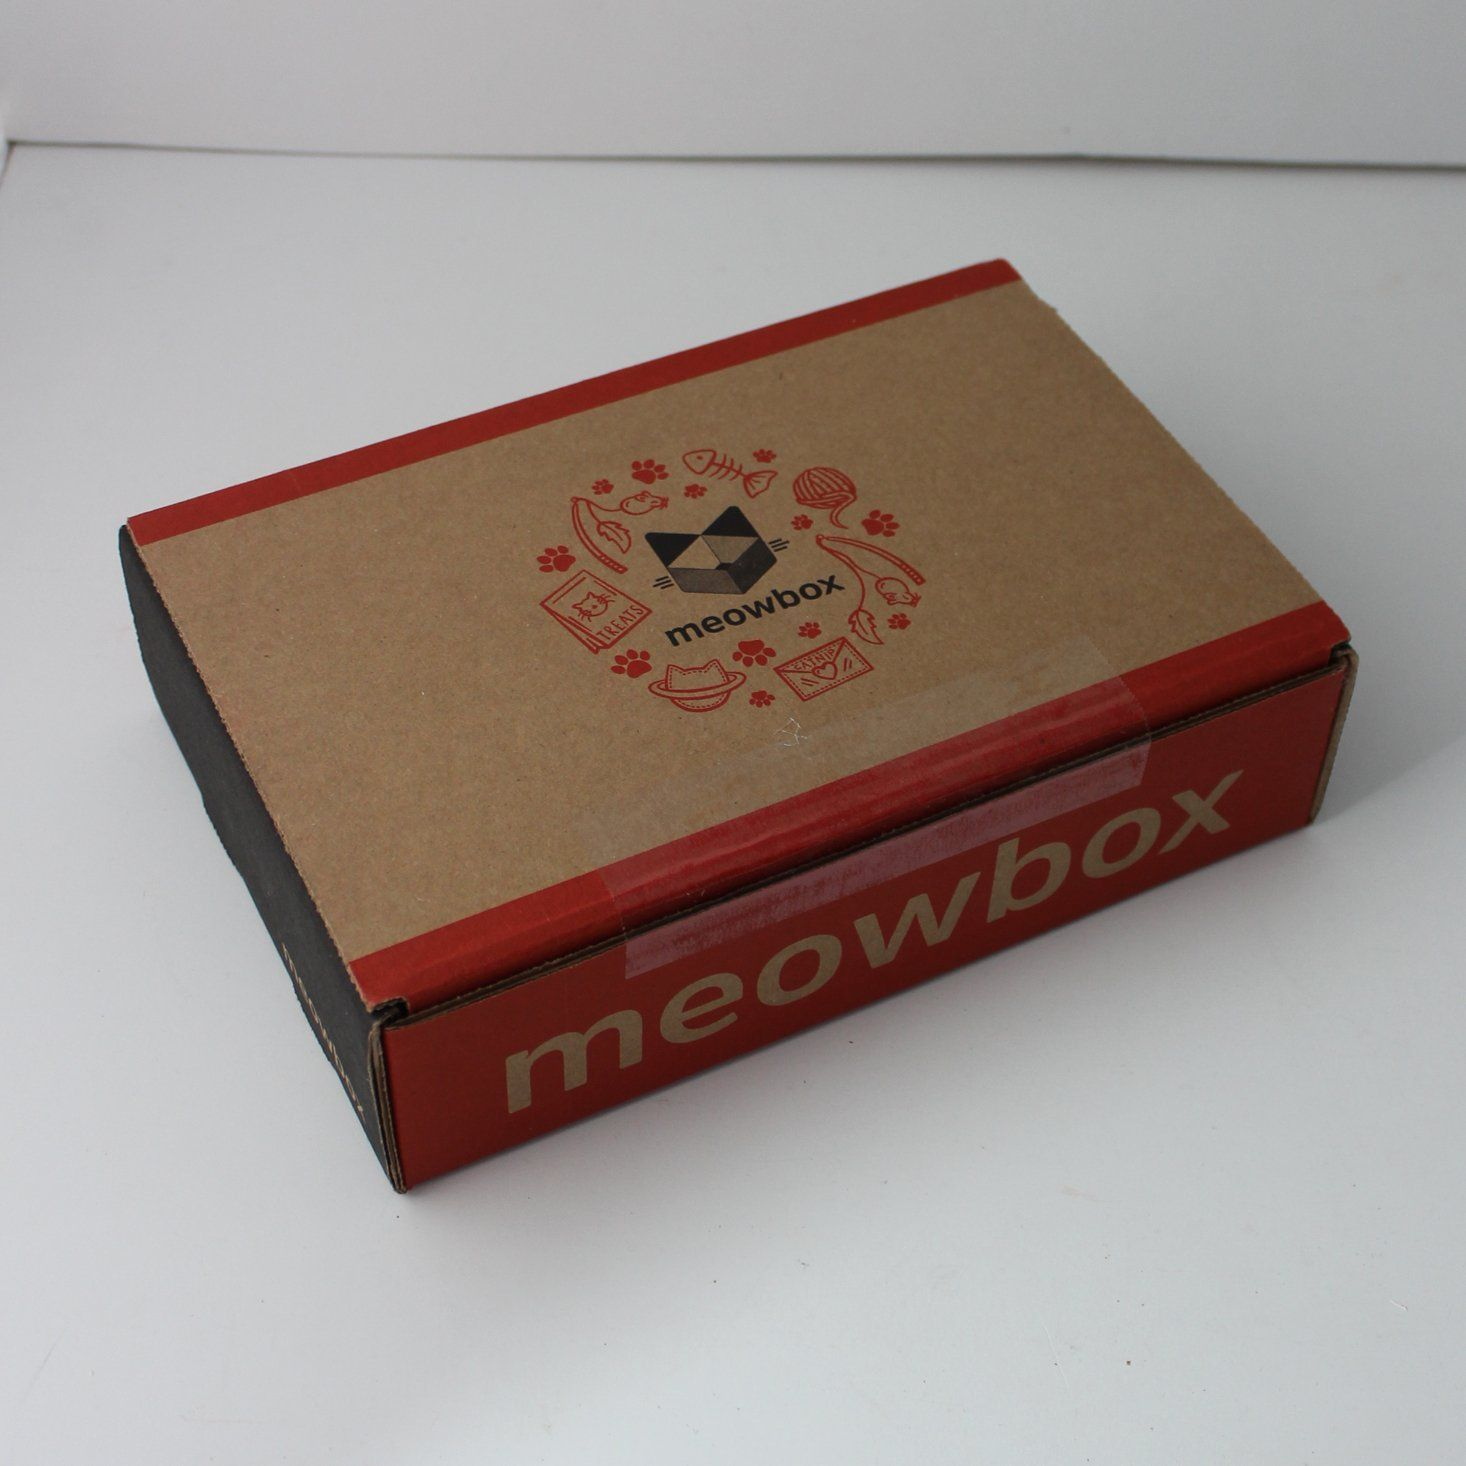 Meowbox in 2020 Unique toys, Subscription boxes, Best